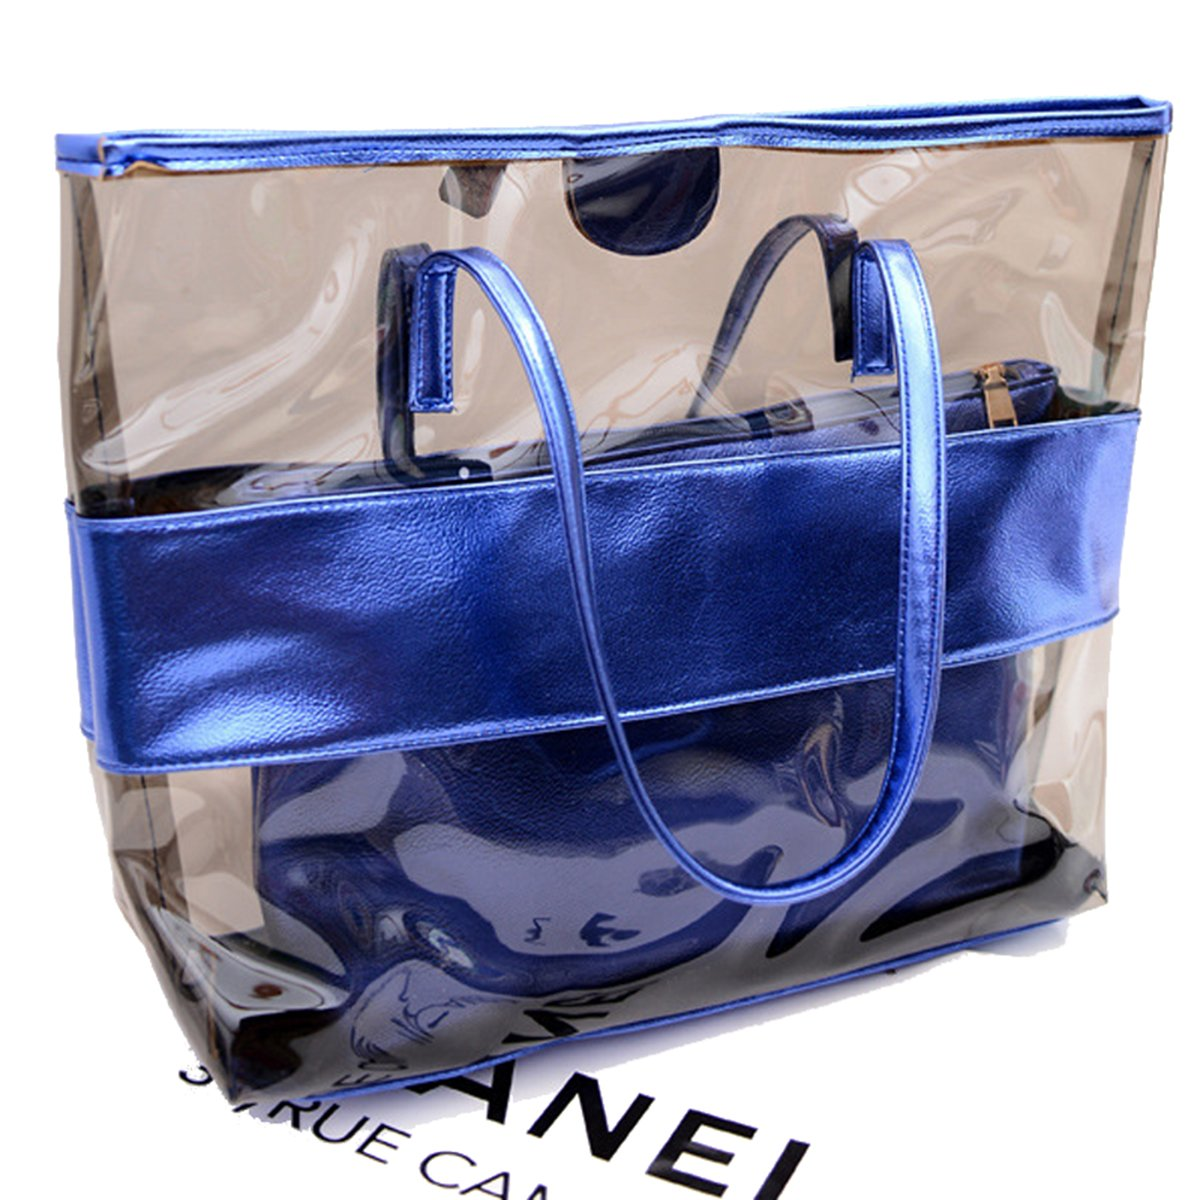 Starbailey Women 2 Piece Tote Bag,Pu Leather Semi Clear PVC Handbag Shoulder Purse Bags, Summer Fashion Weekender Bag -Blue Color